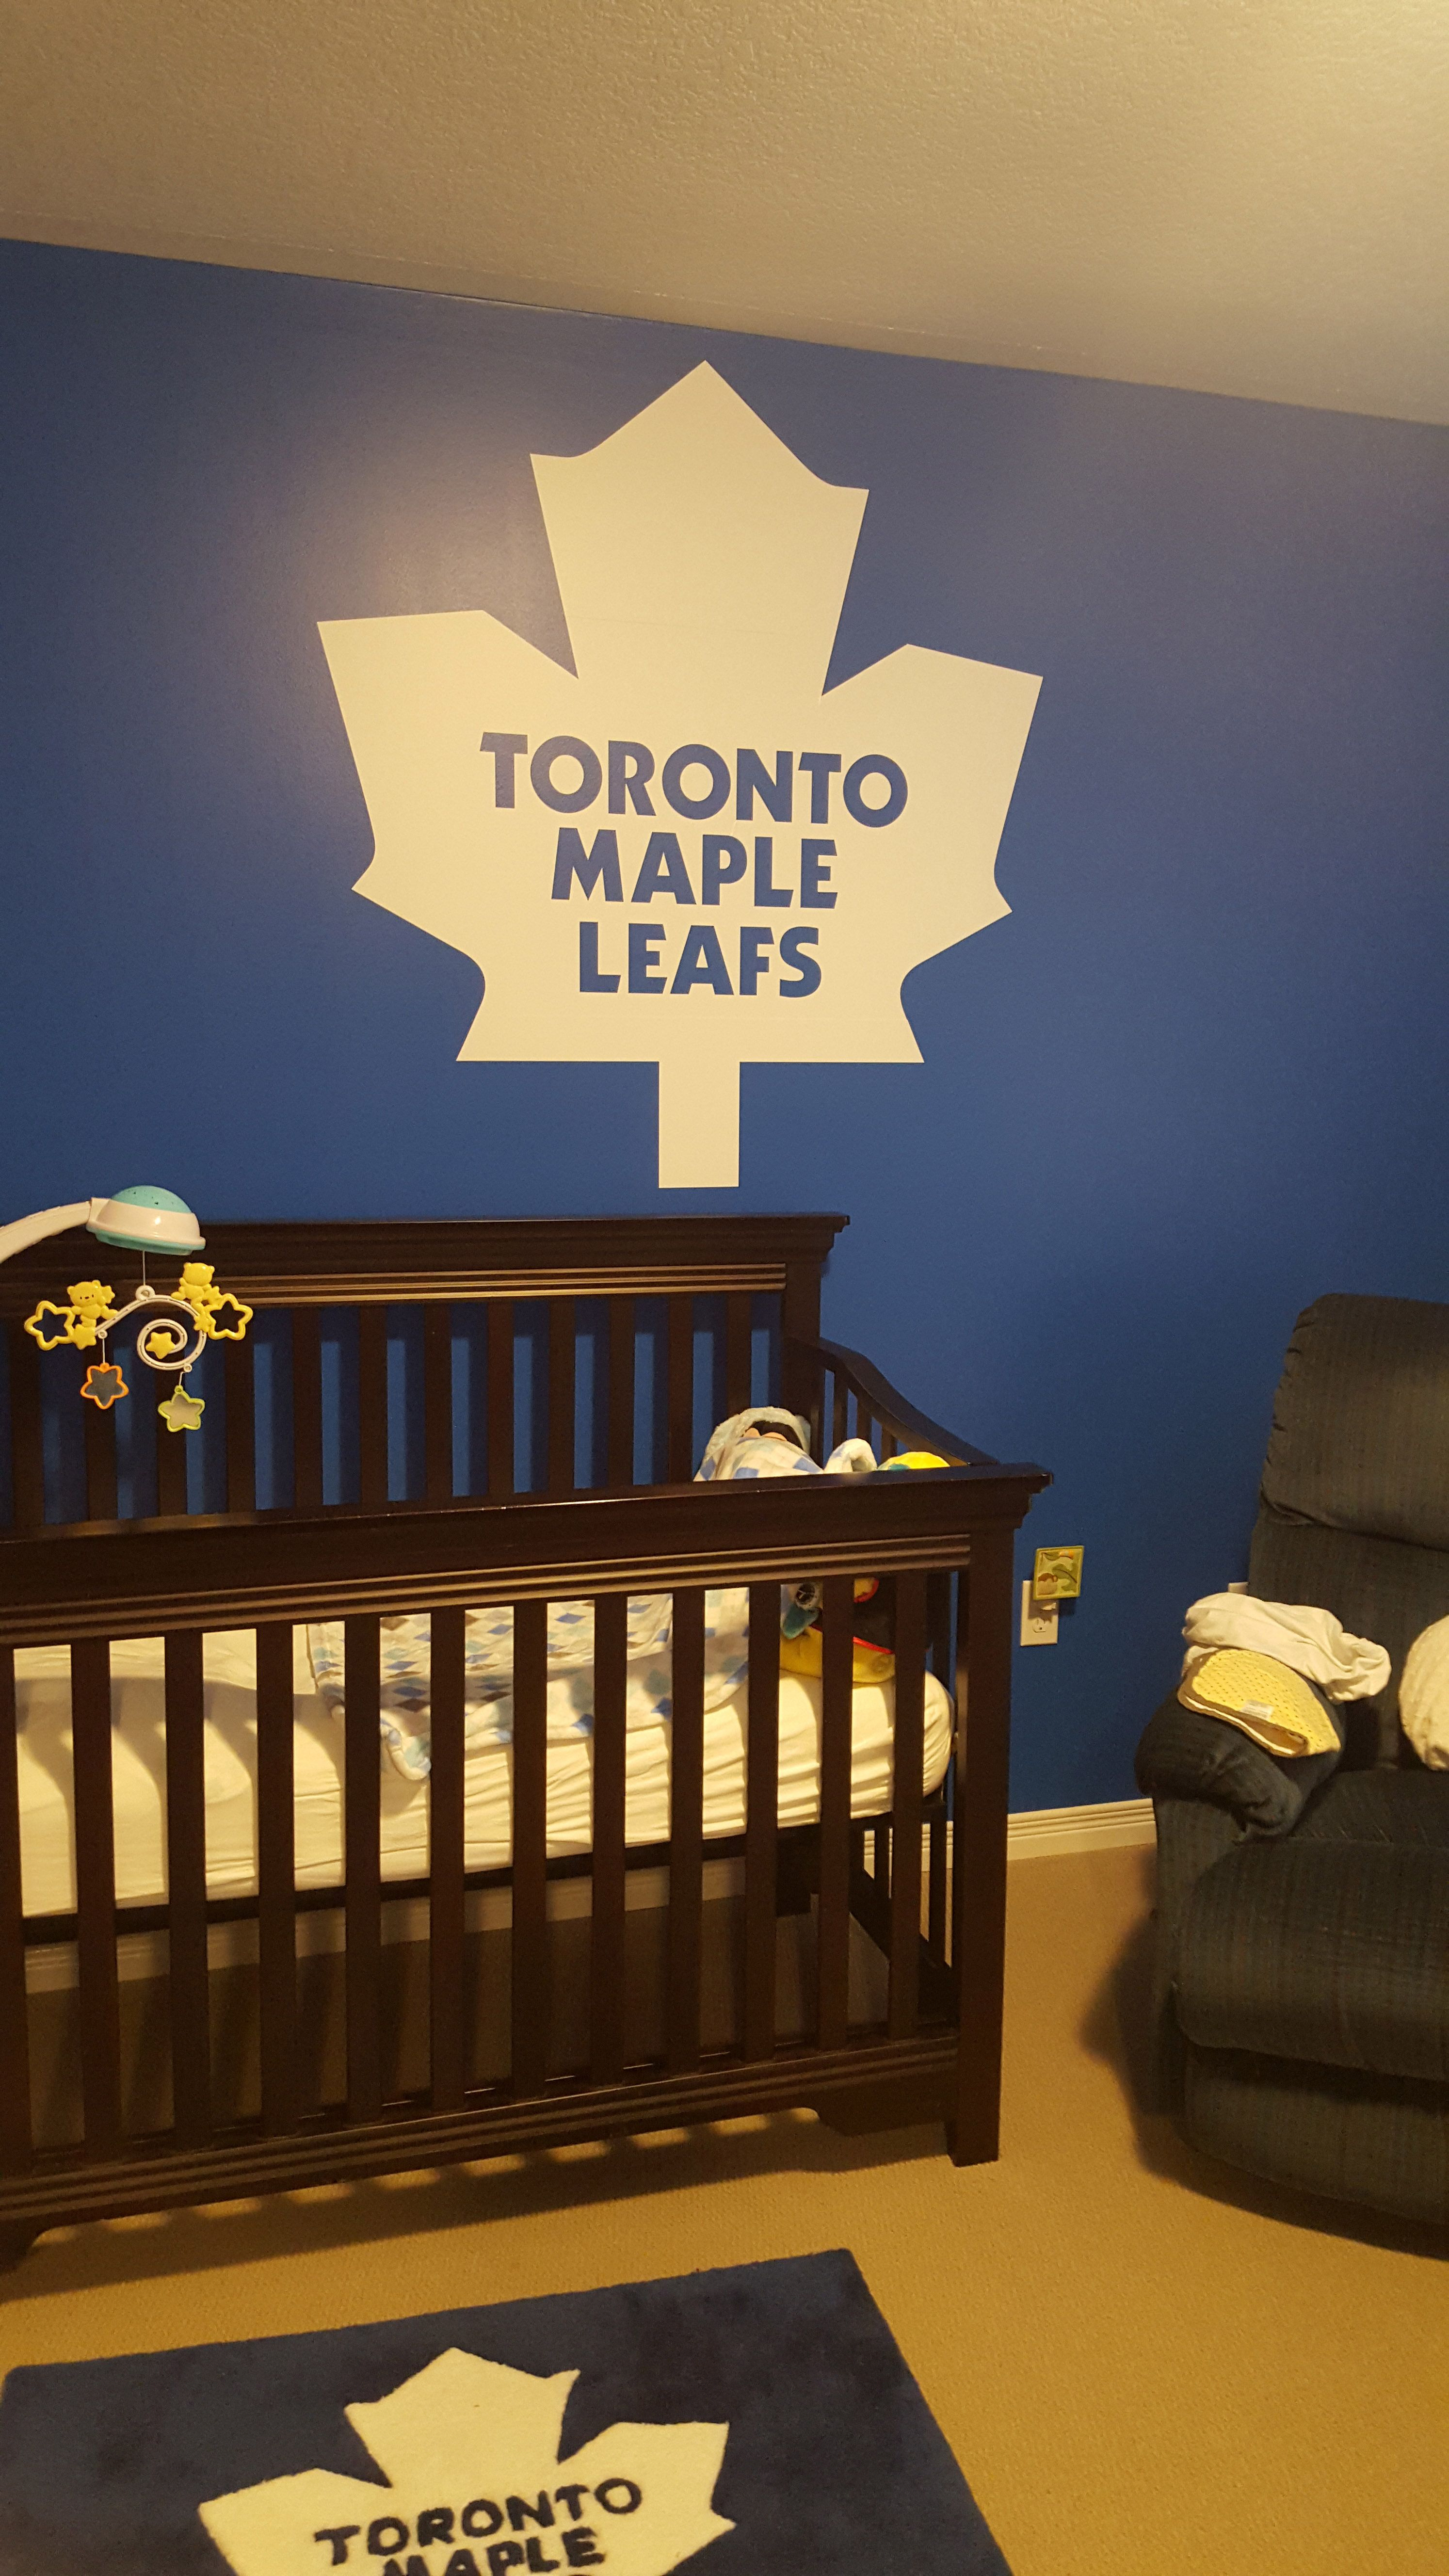 Ice Hockey Team Toronto Maple Leafs 19702016 Logo Sport